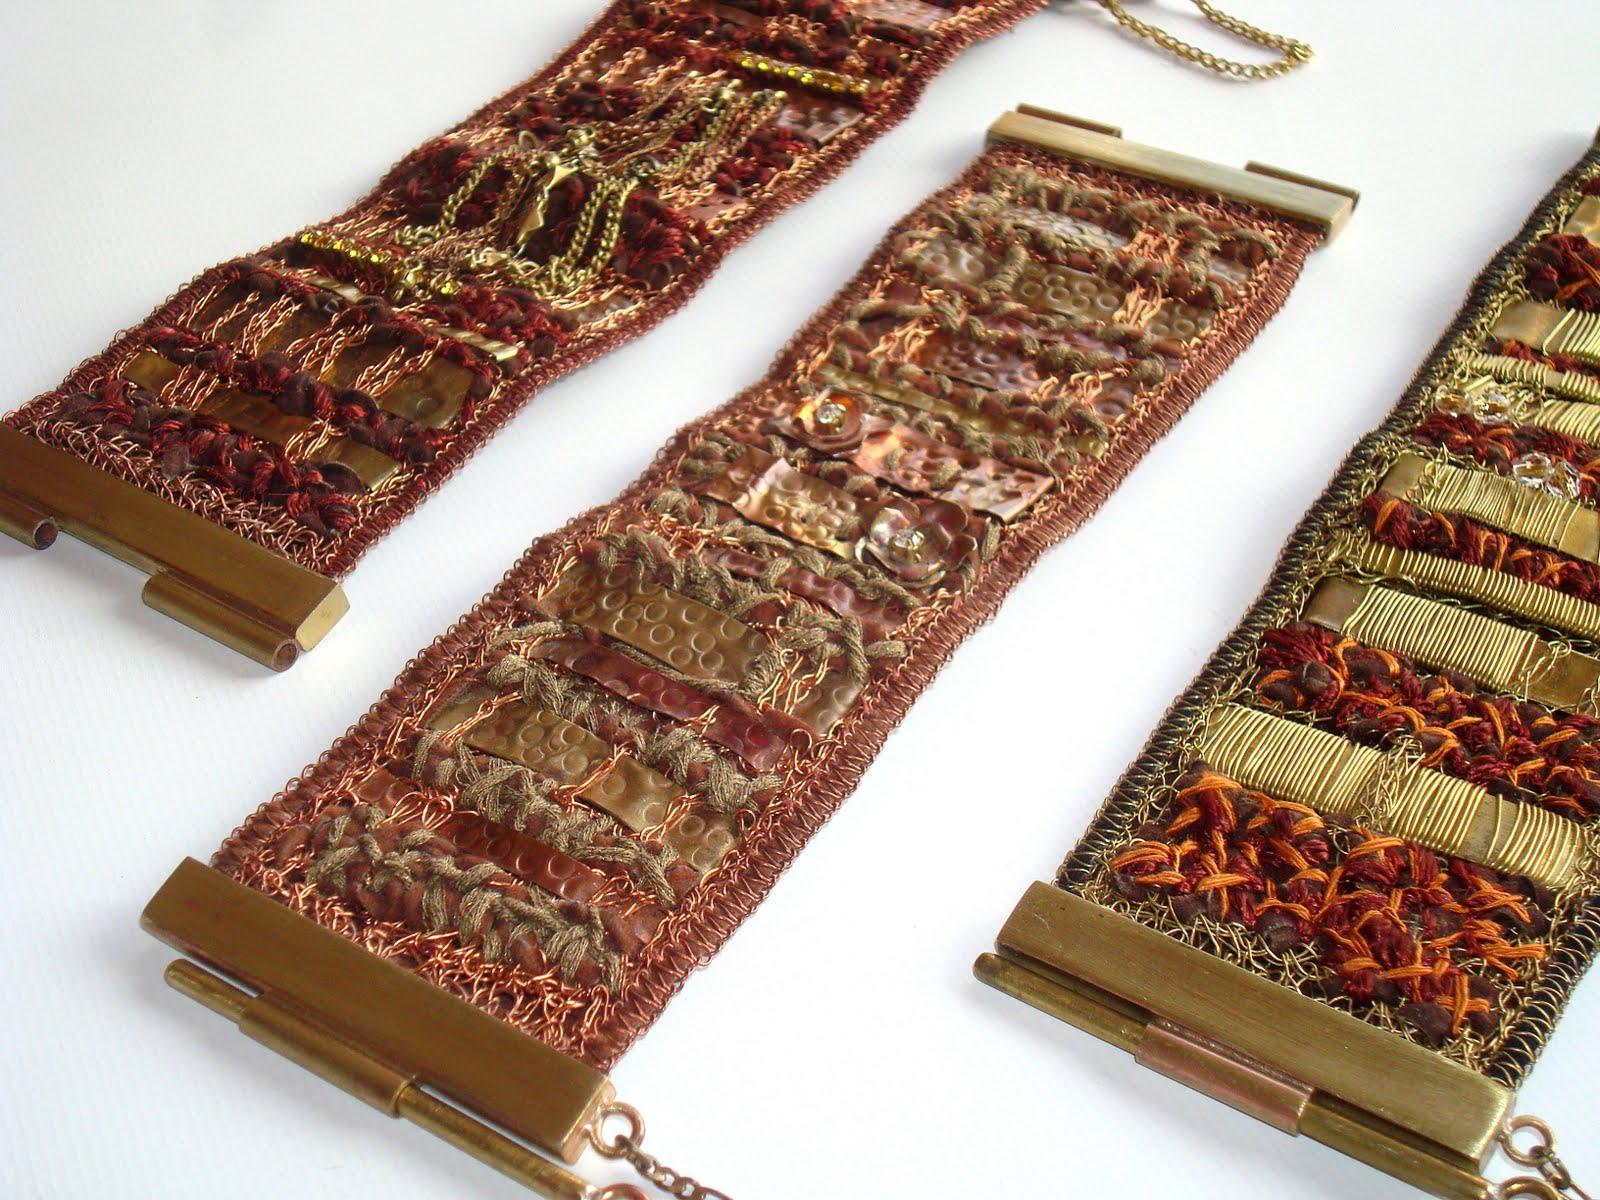 Pulseras de bronce e hilo de seda tejidas en telar manual